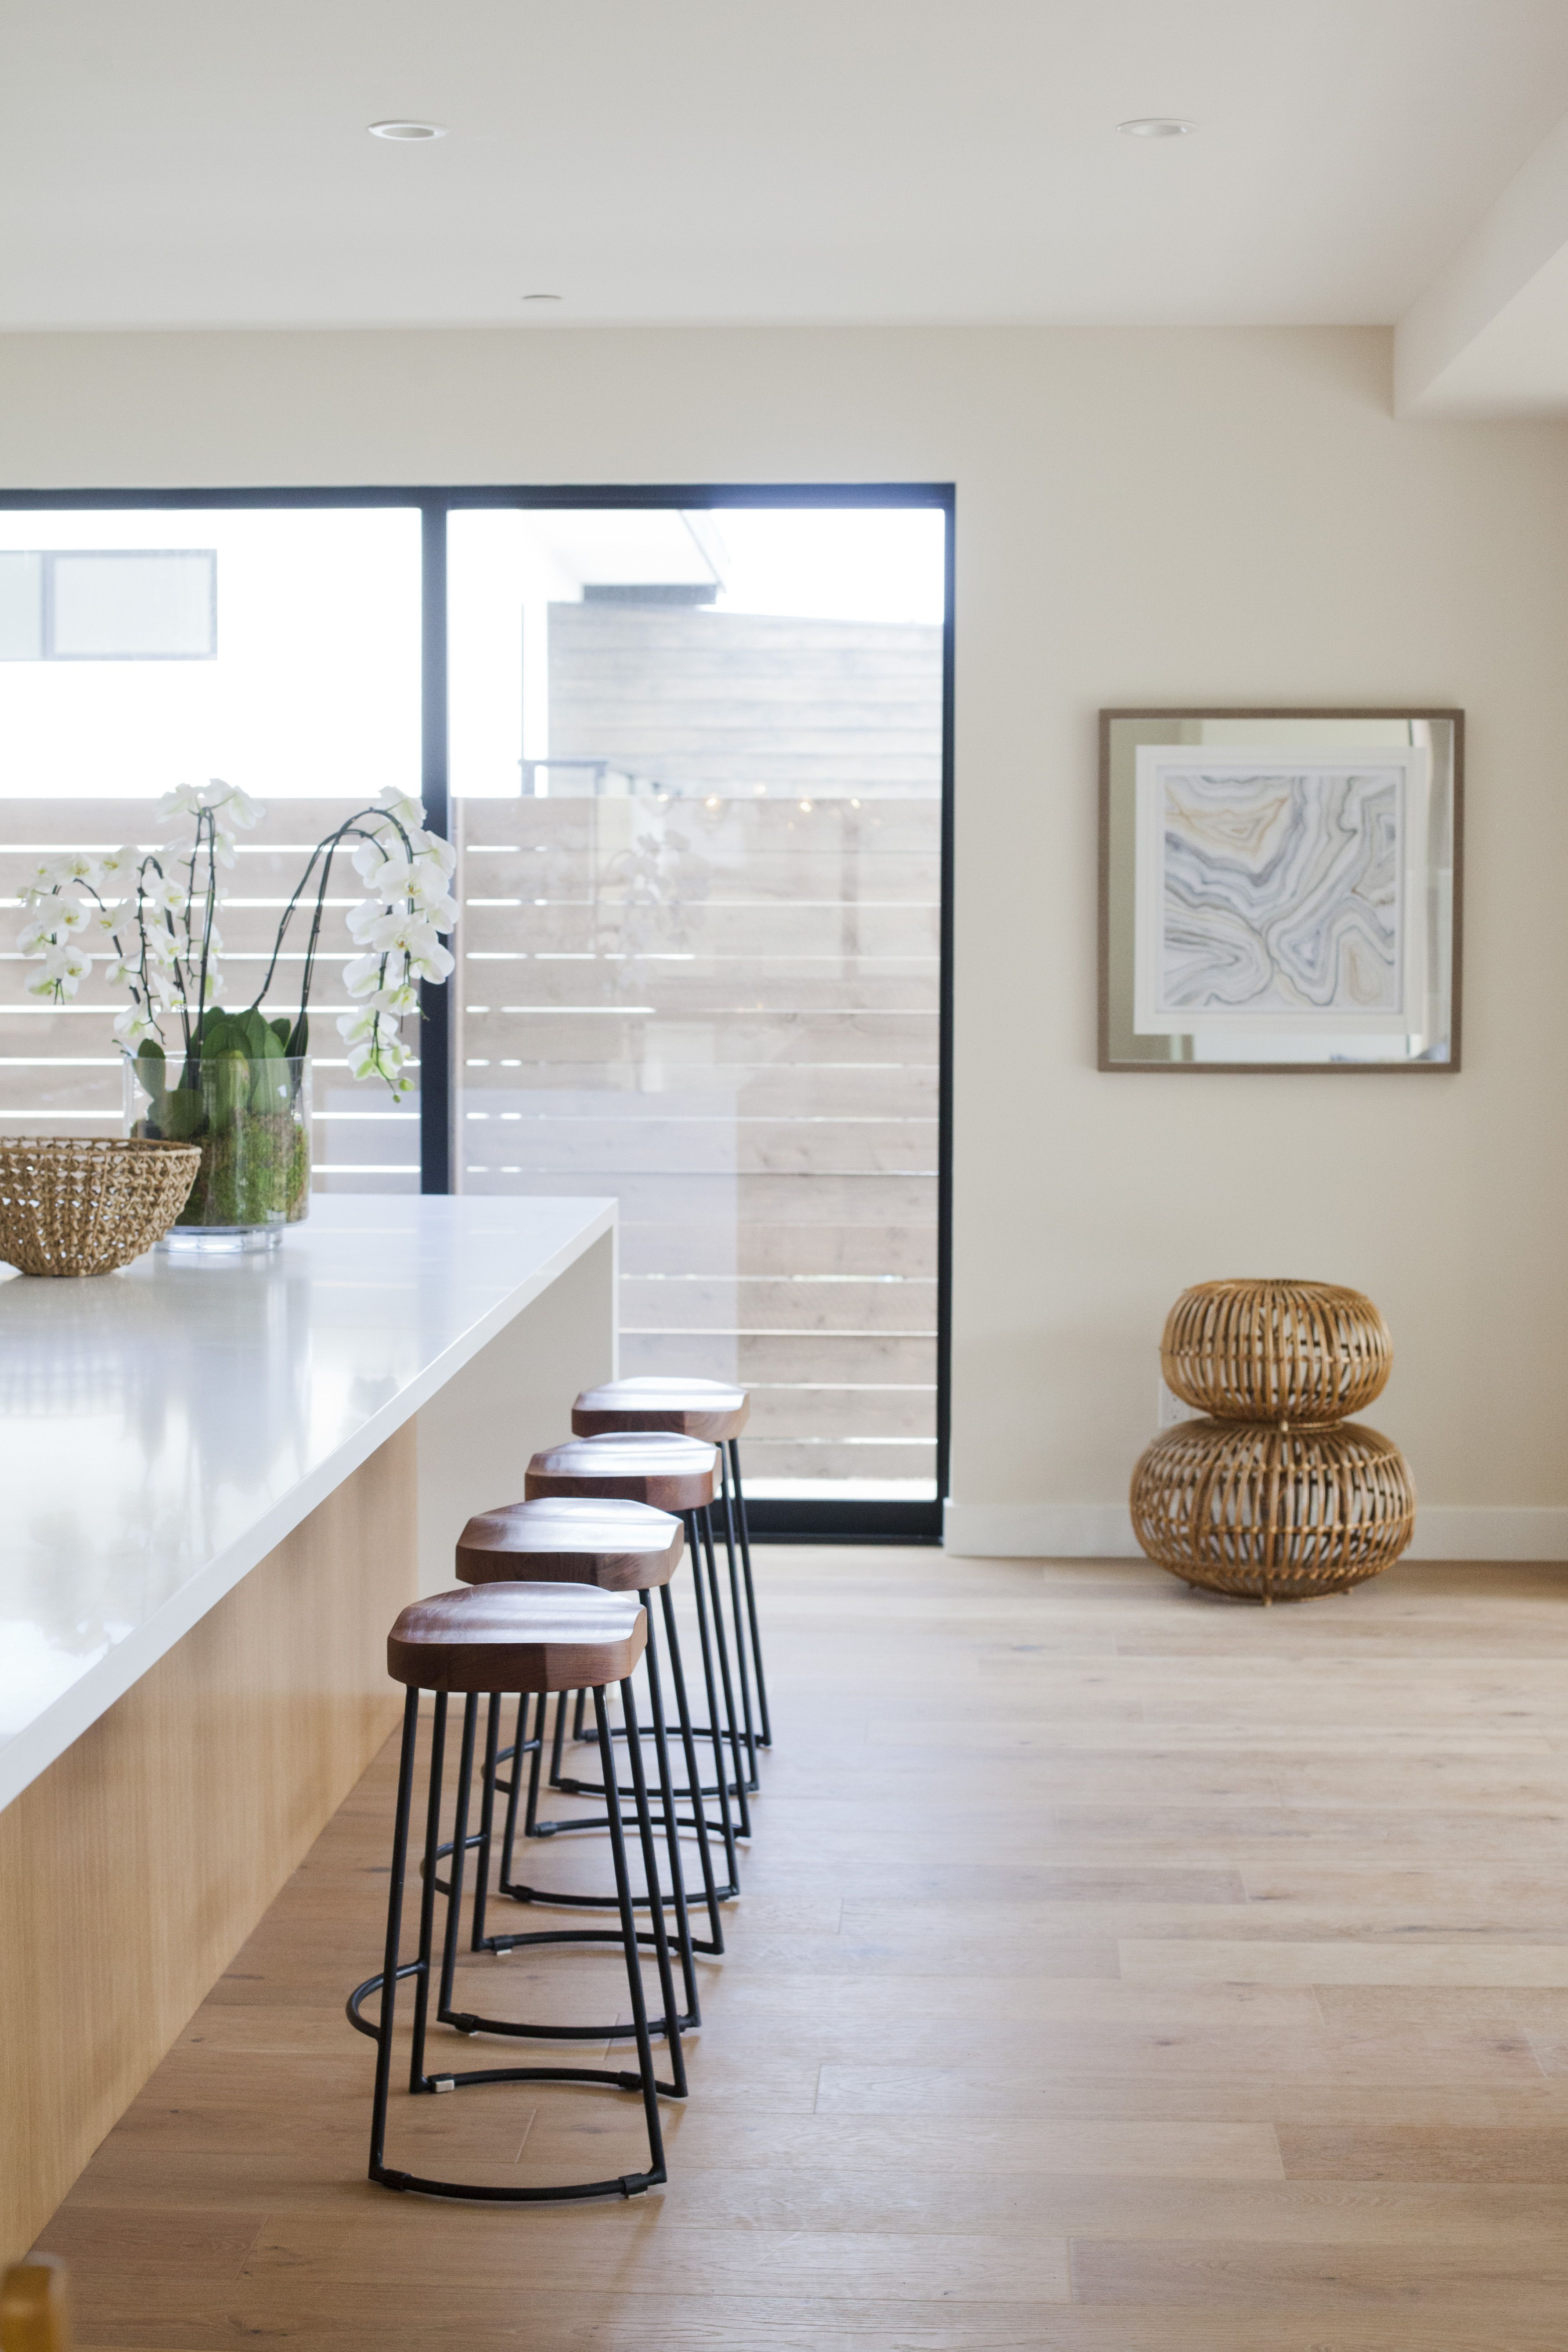 Minimalist White And Natural Wood Finish Kitchen Design  San Alluring Kitchen Designers San Diego Decorating Inspiration